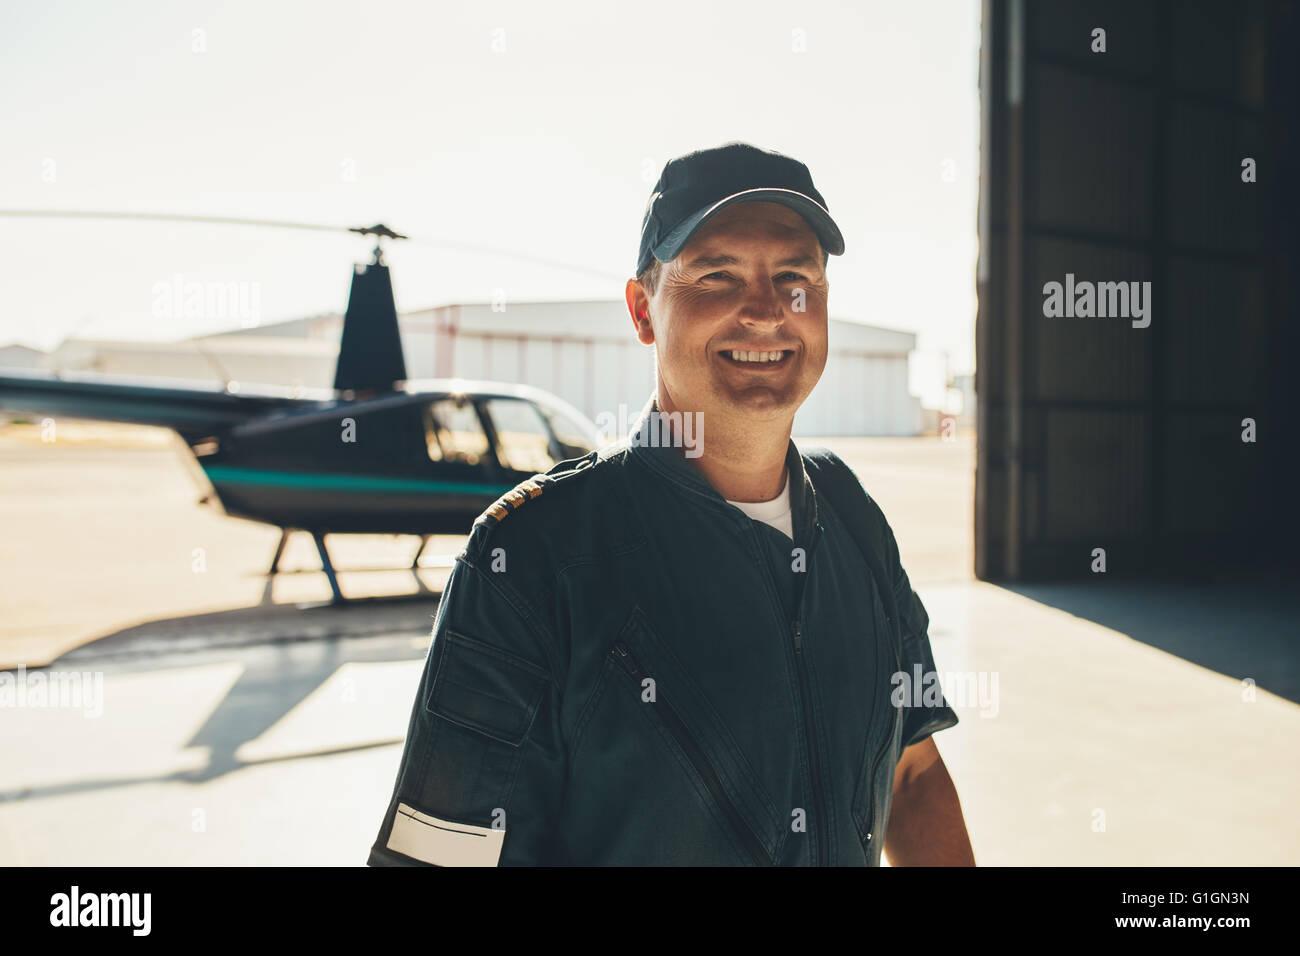 Retrato de feliz masculina permanente piloto en avión hangar con un helicóptero en segundo plano. Imagen De Stock